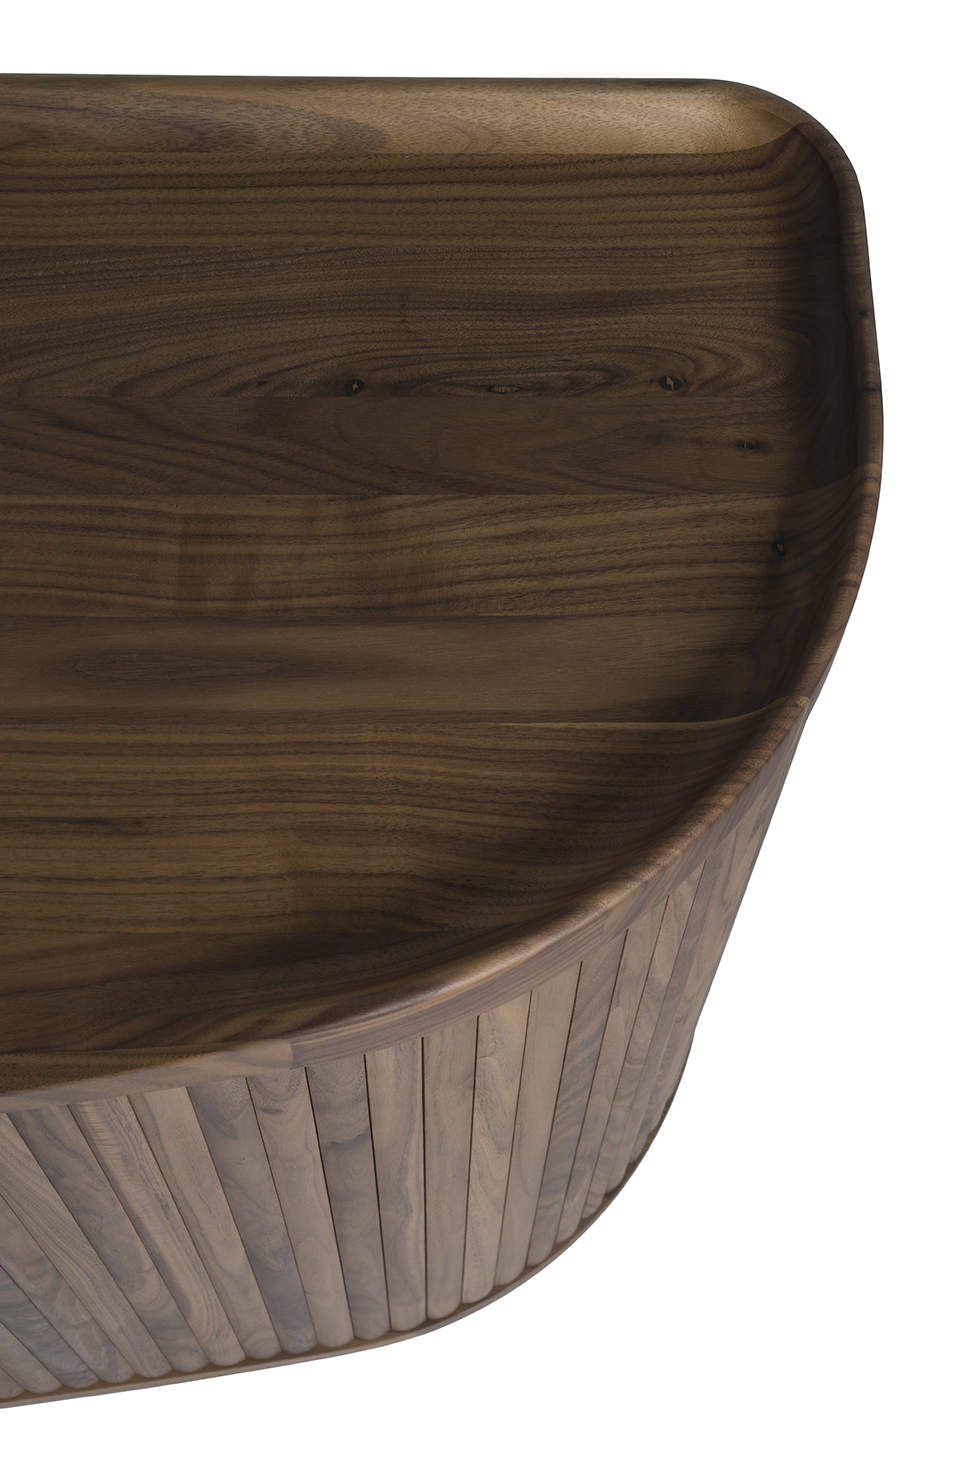 detail shot of a walnut wooden cupboard designed by Sjoerd Vroonland for Revised furniture